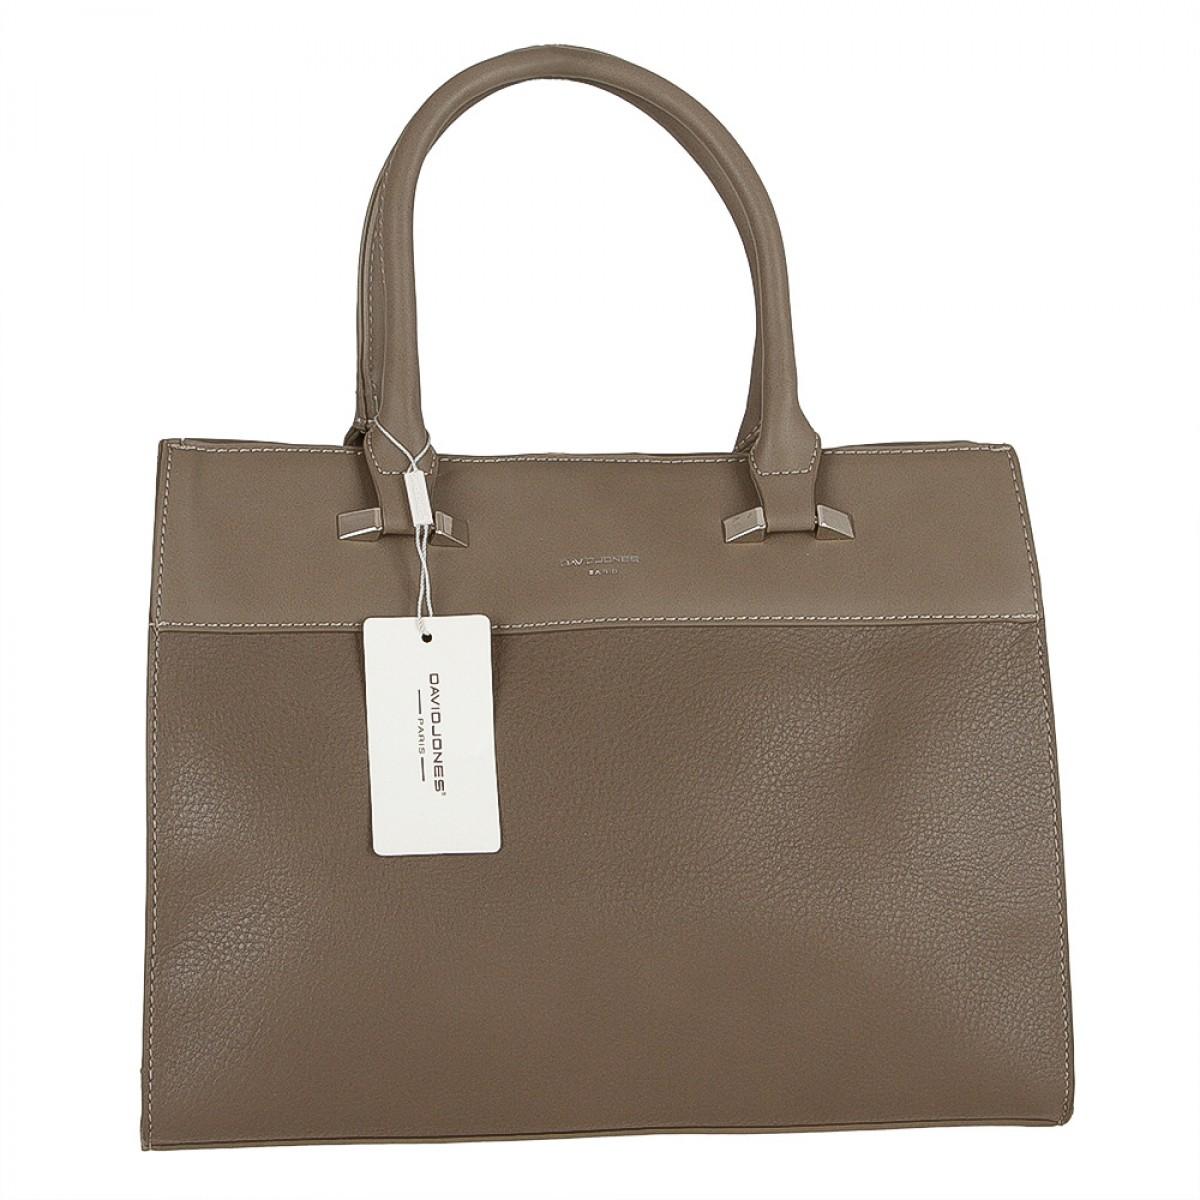 Жіноча сумка David Jones CM3508 D.TAUPE